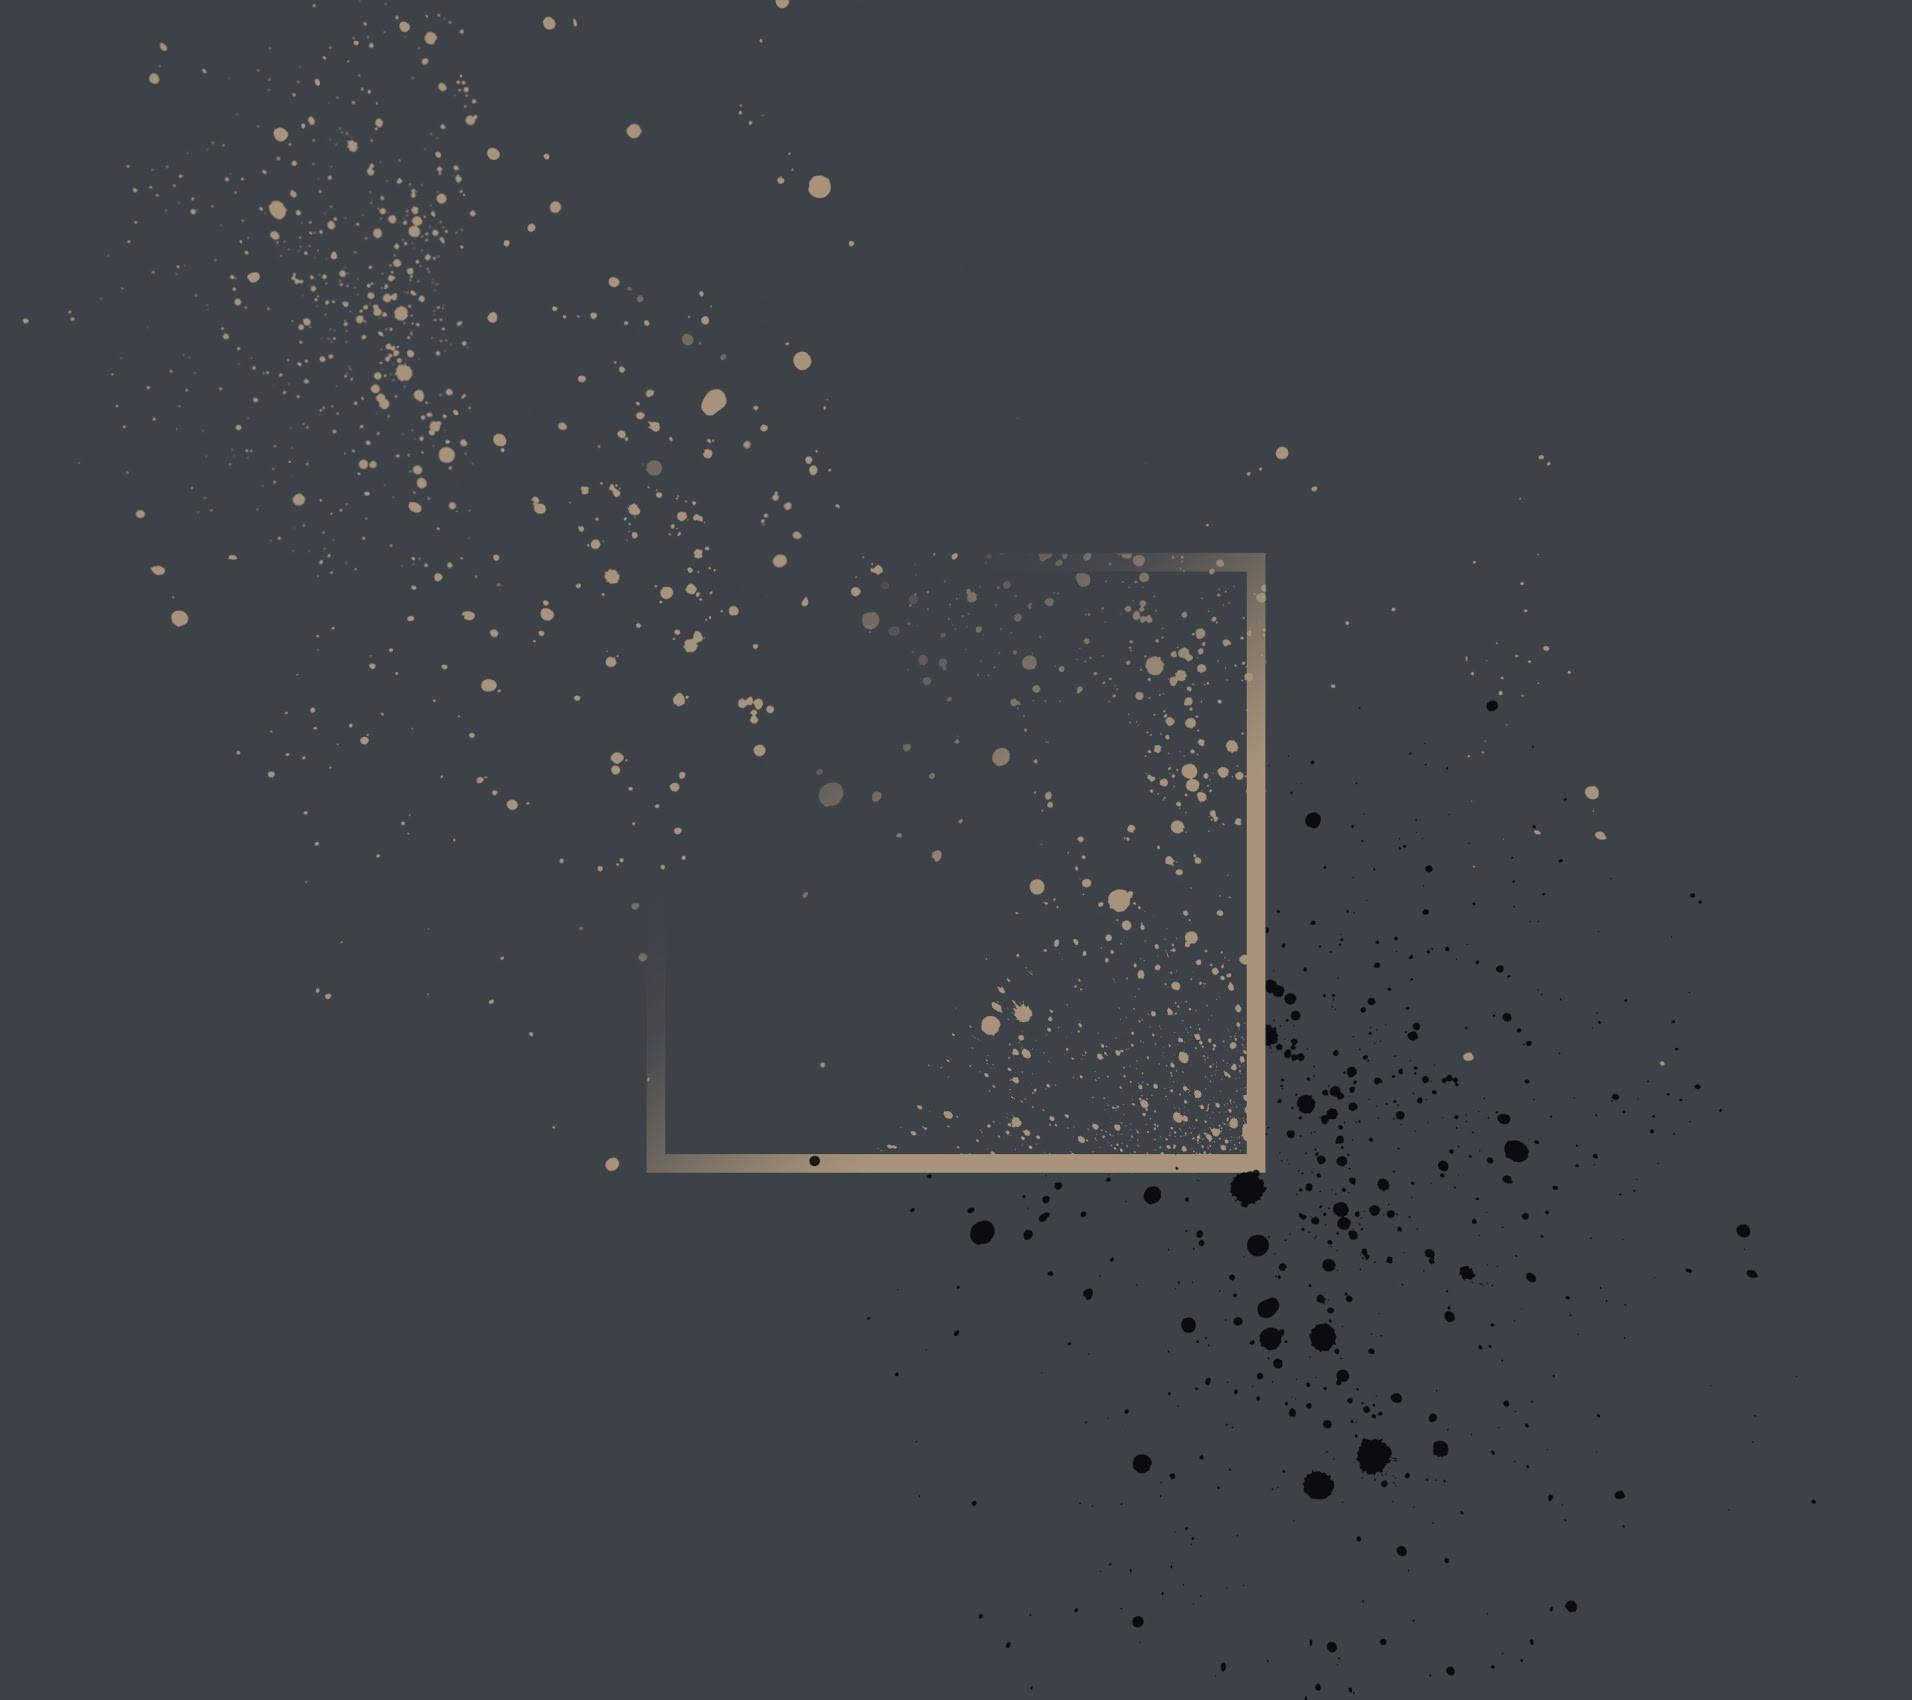 Wallpaper Illustration Abstract Minimalism Sky Moon Atmosphere Paint Splatter Astronomy Constellation Star Line Screenshot Font Astronomical Object 1912x1700 Maharaj 54996 Hd Wallpapers Wallhere